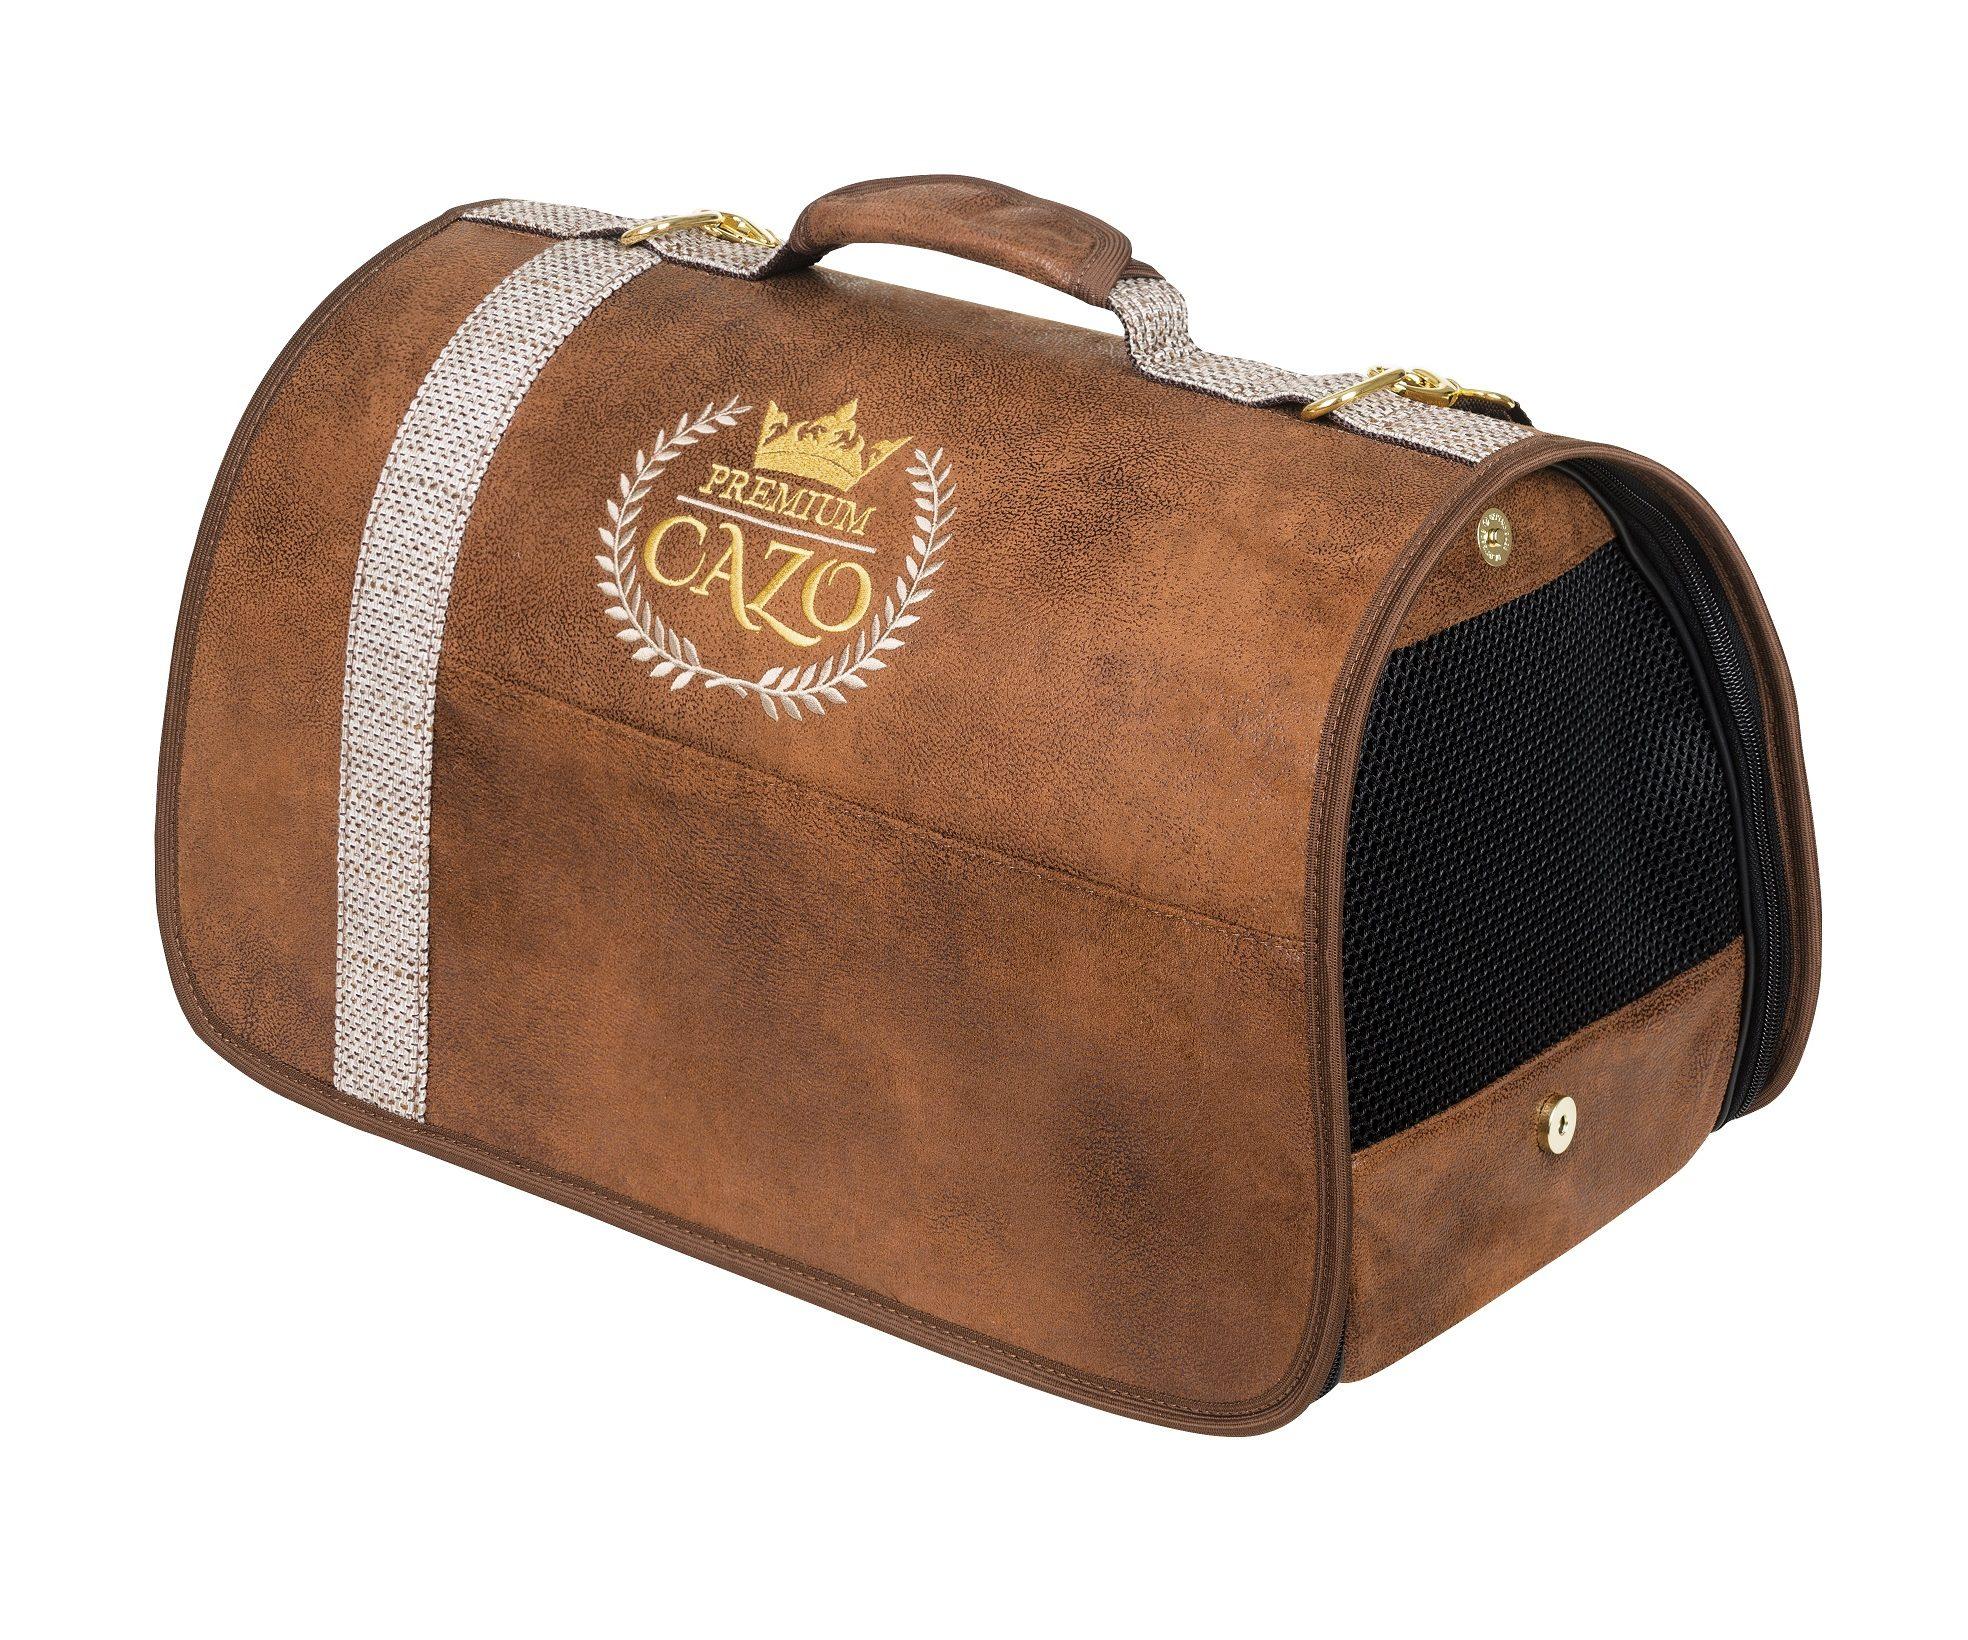 Transportná taška Cazo Premium 0f303895393